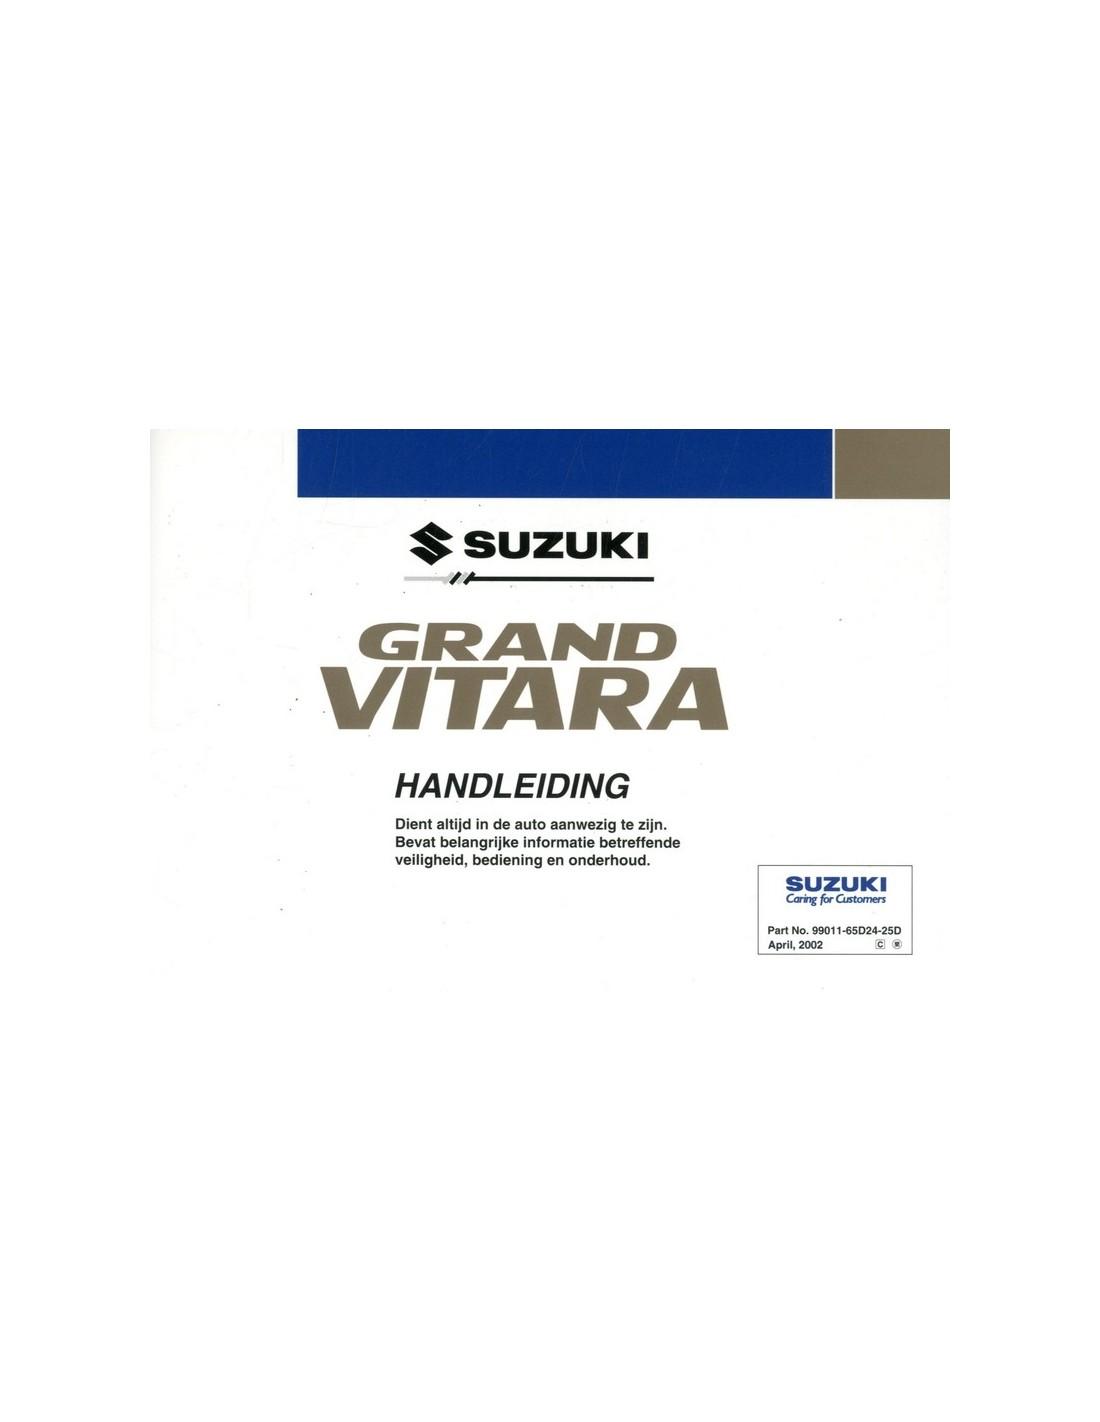 2002 suzuki grand vitara owners manual